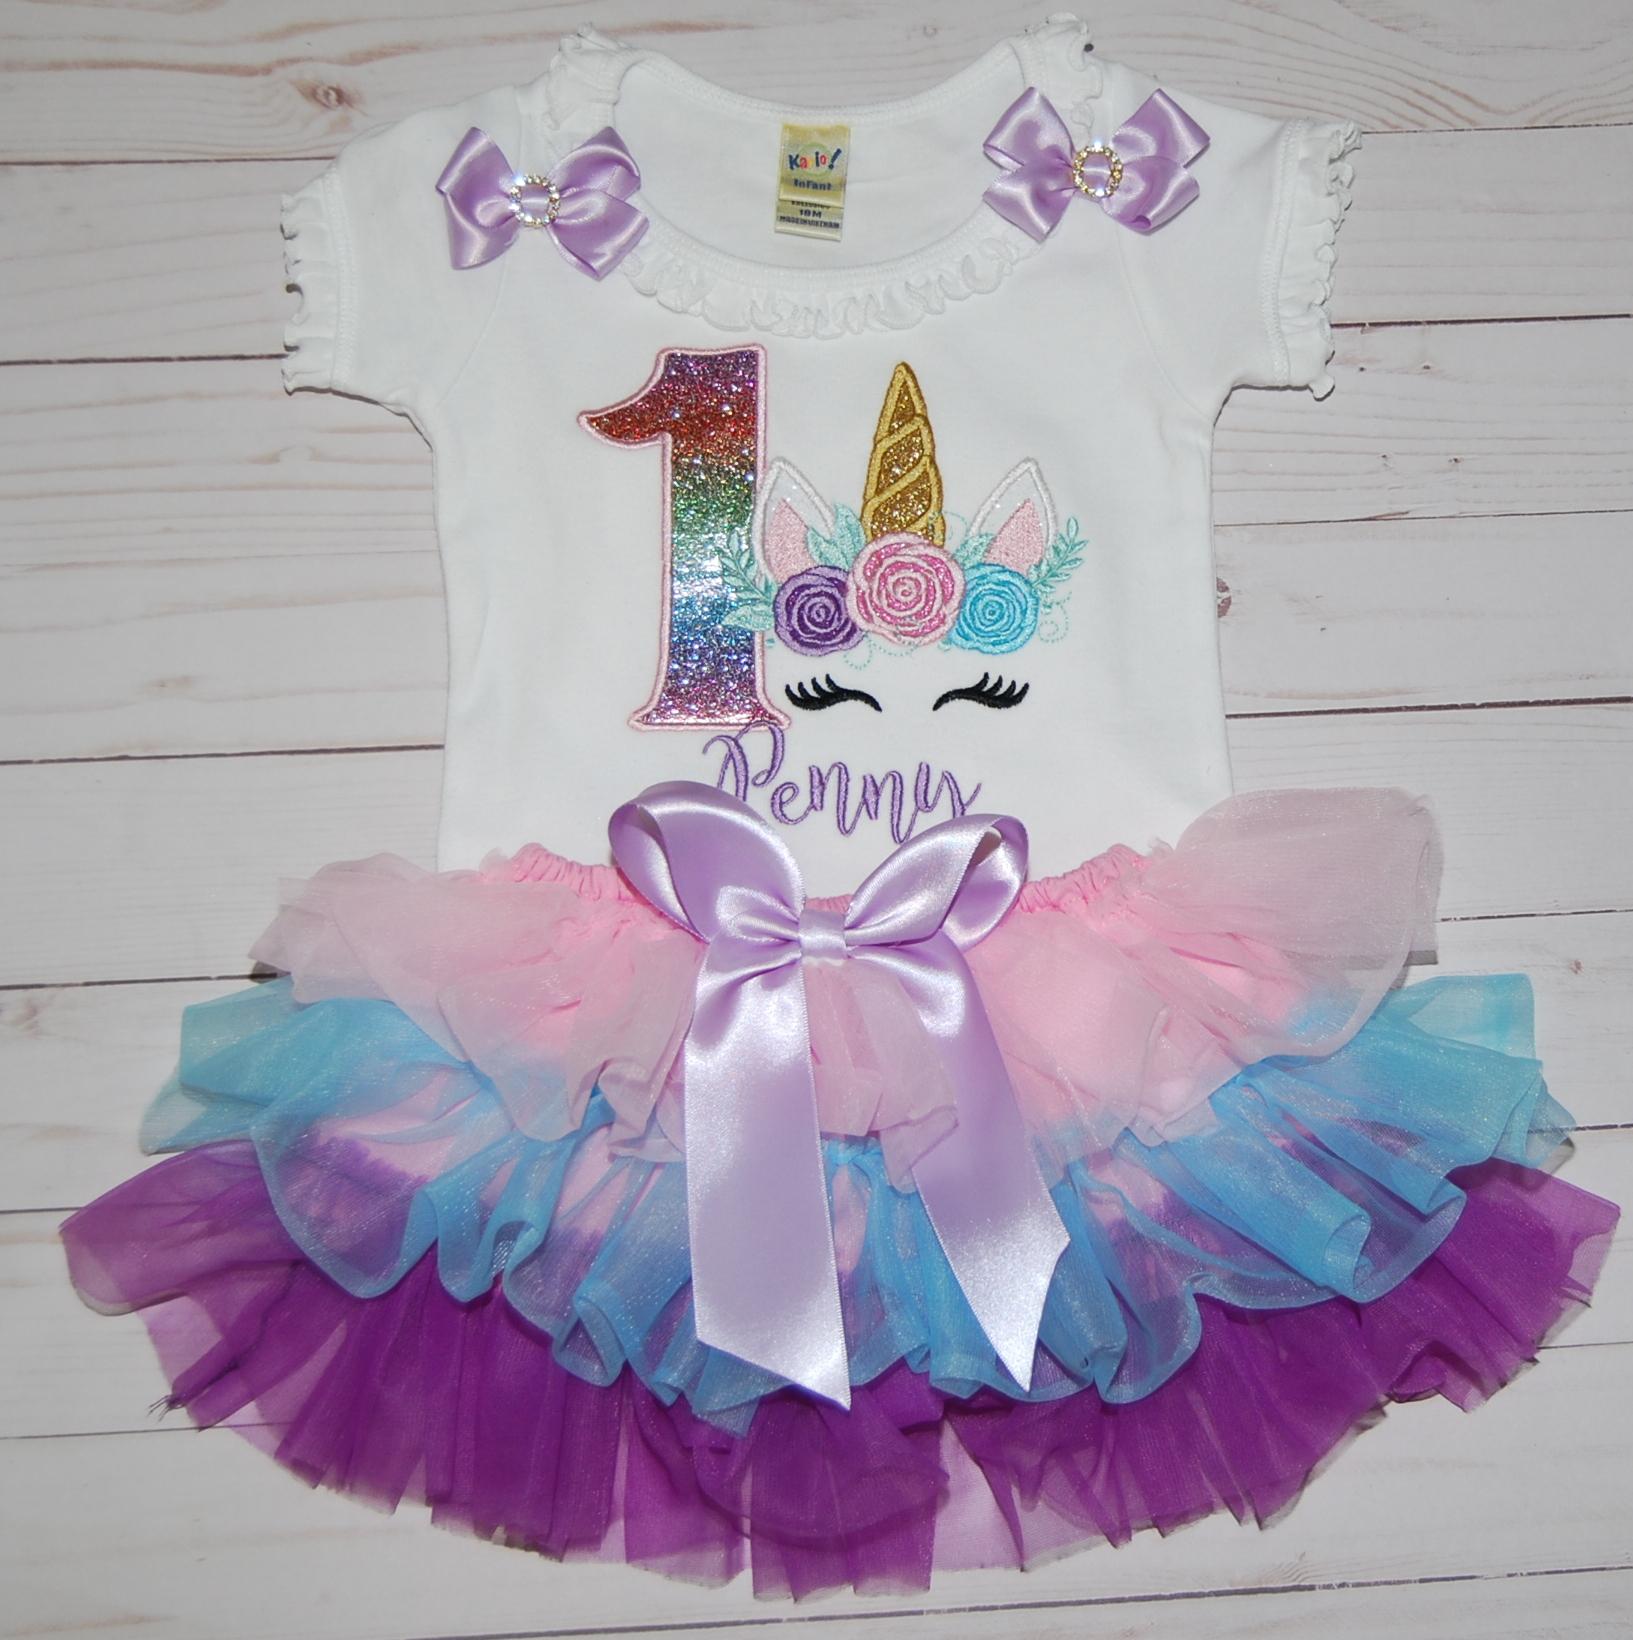 Rainbow glitter unicorn 1st birthday cake smash outfit, perfect for photoshoot